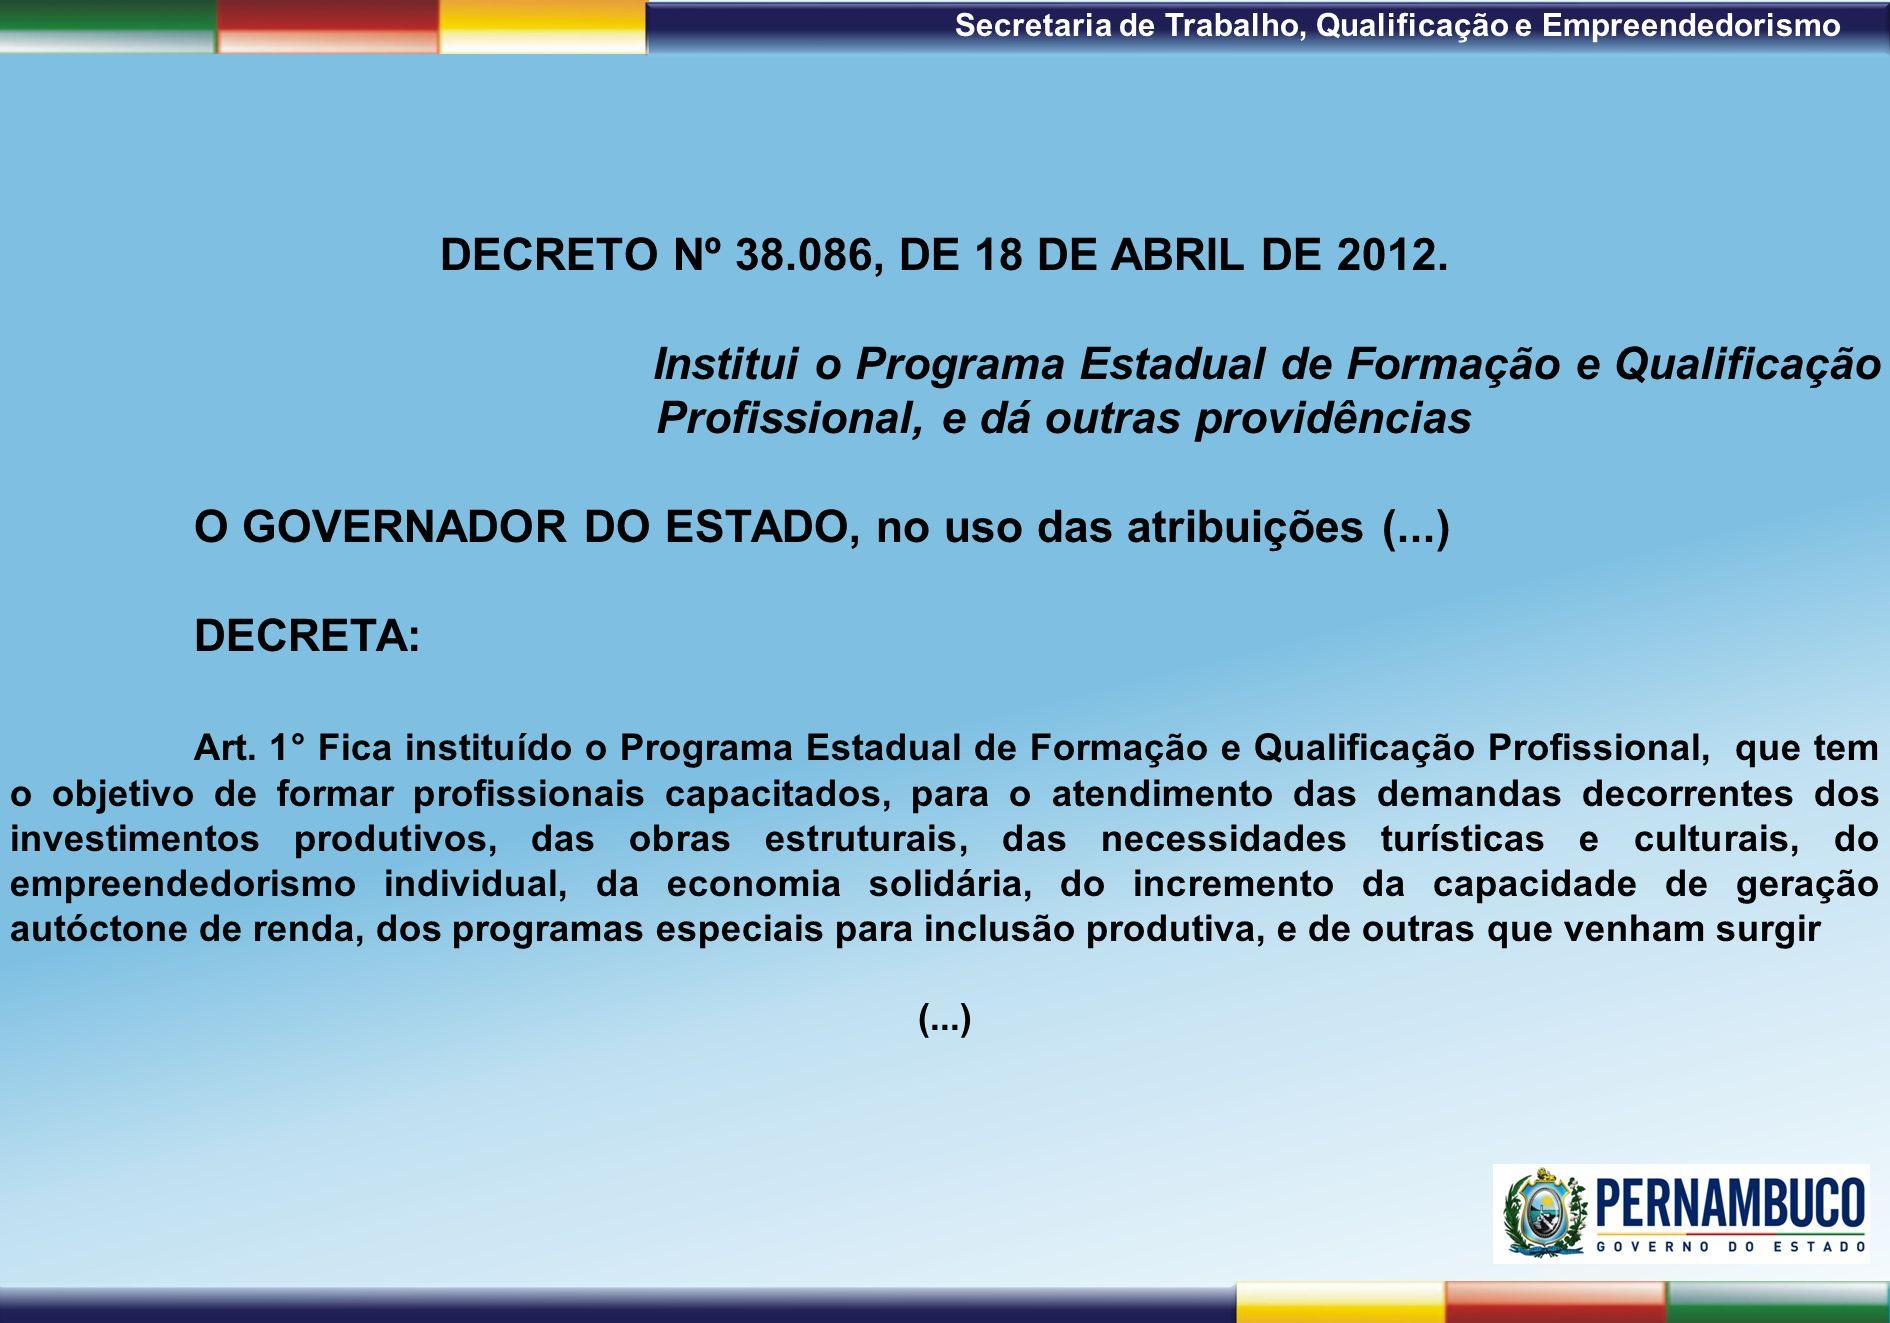 DECRETO Nº 38.086, DE 18 DE ABRIL DE 2012.